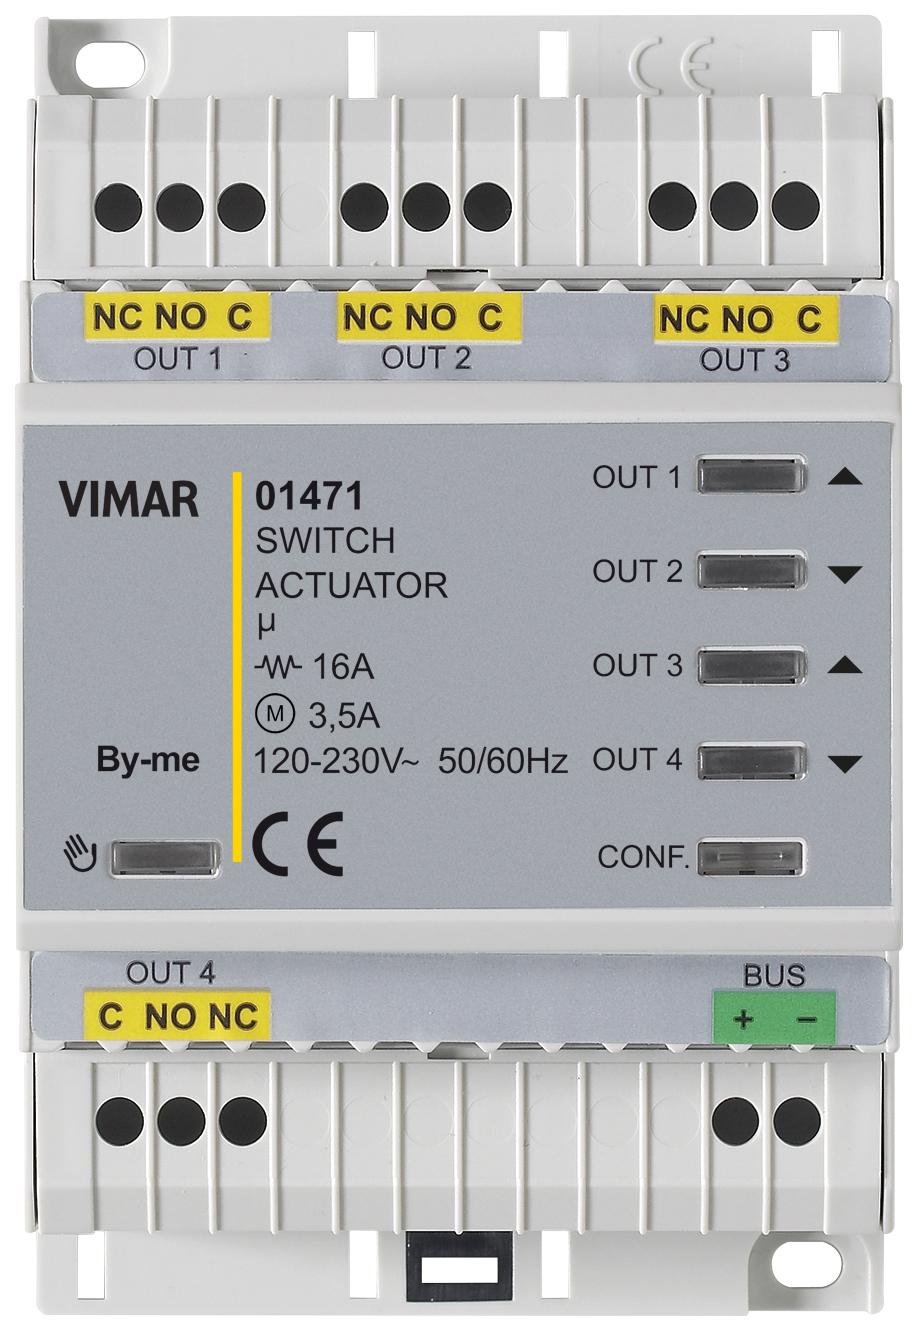 Schema Elettrico Per Domotica : Schema elettrico domotica impianto